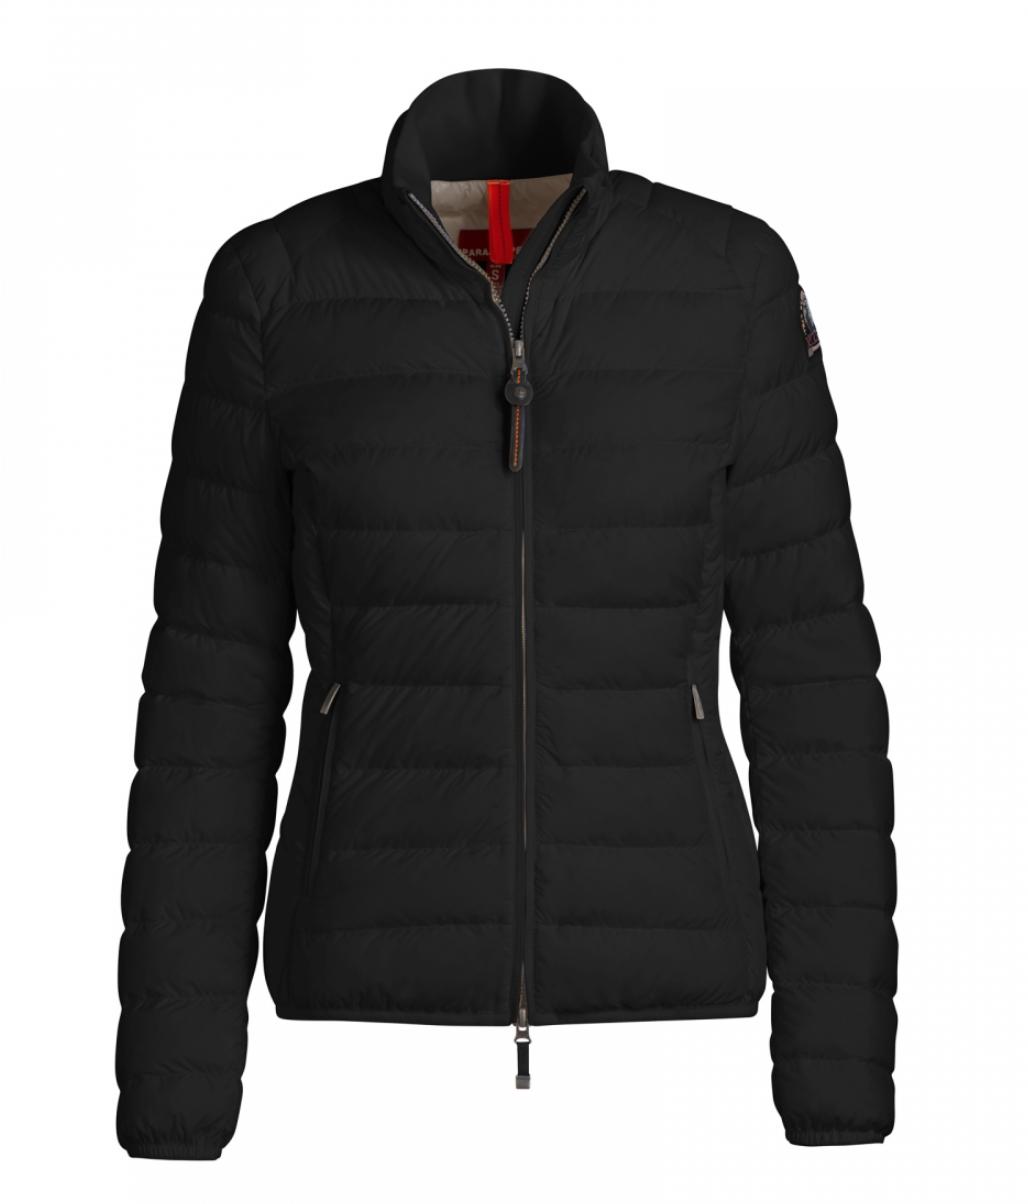 Parajumpers Geena super light weight puffer jacket - black